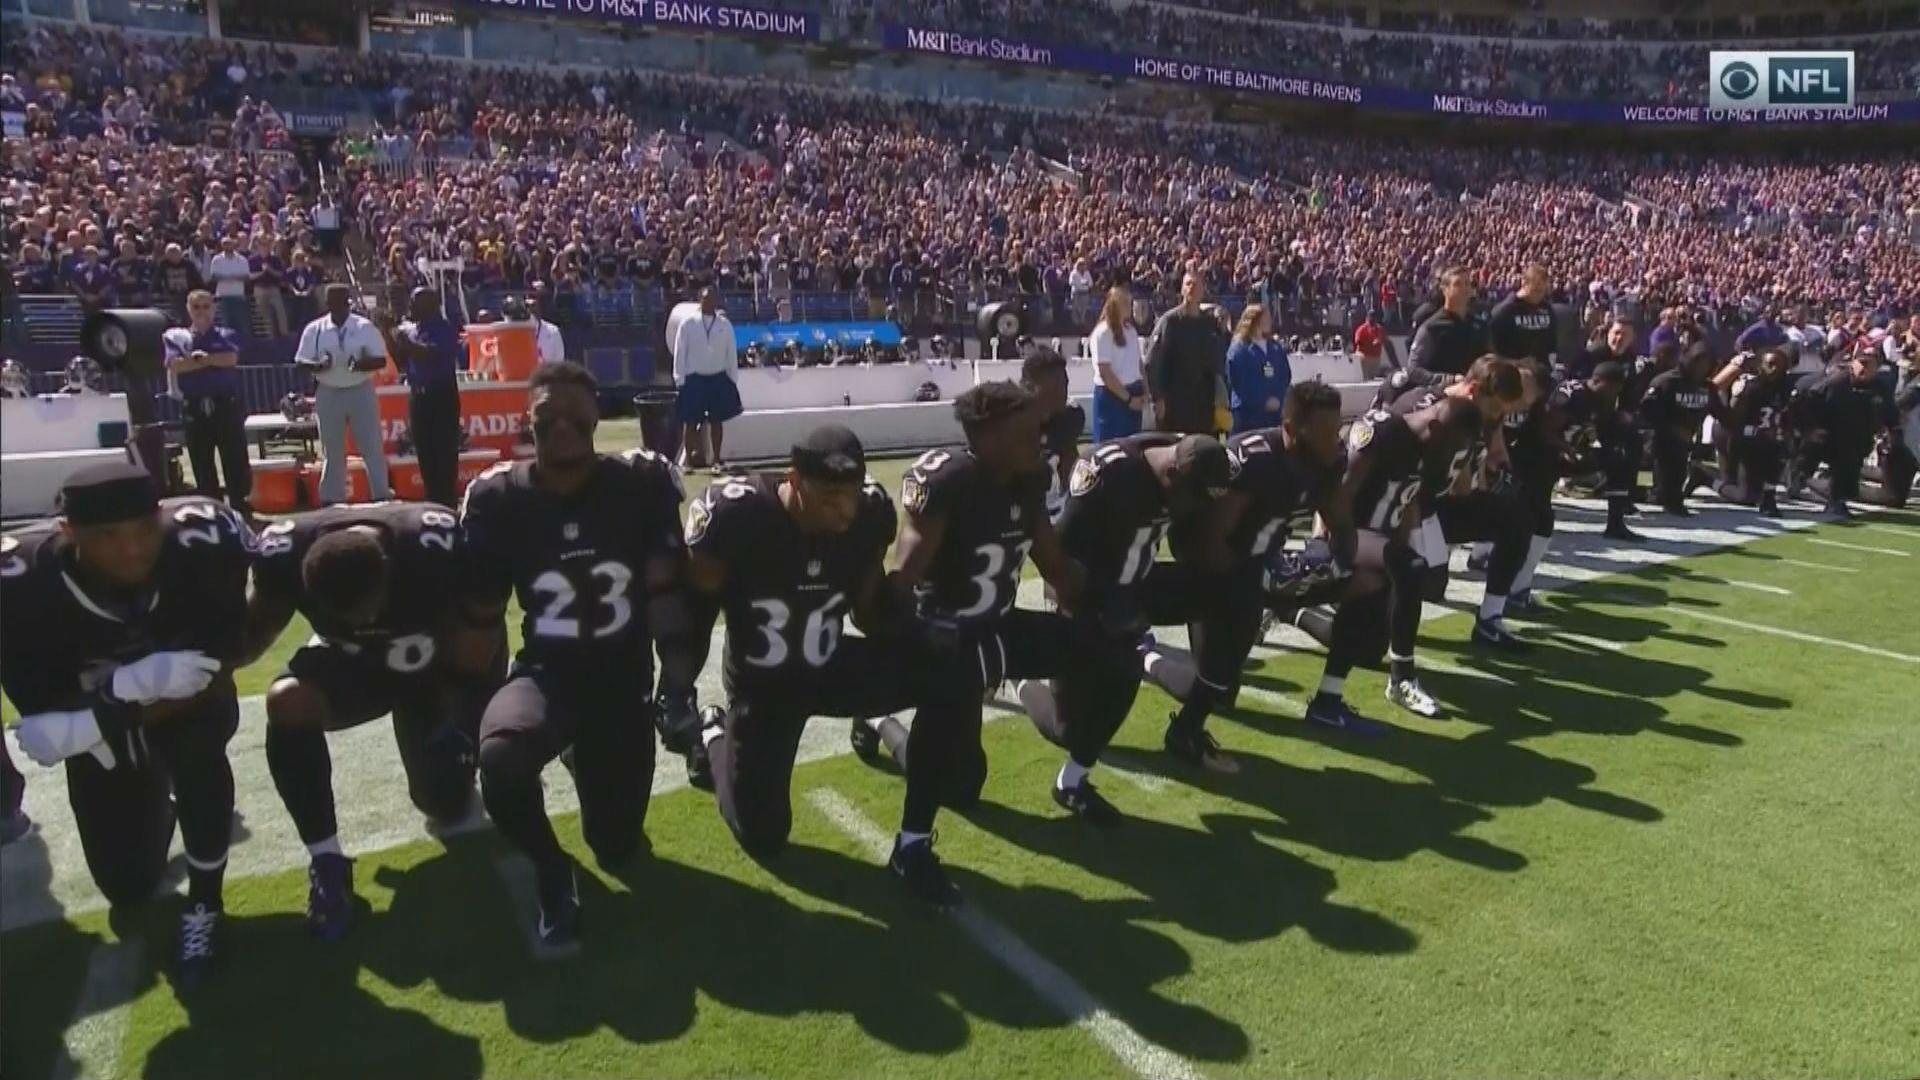 d43845a7474 Ravens fans boo their team for kneeling prior to national anthem -  SBNation.com